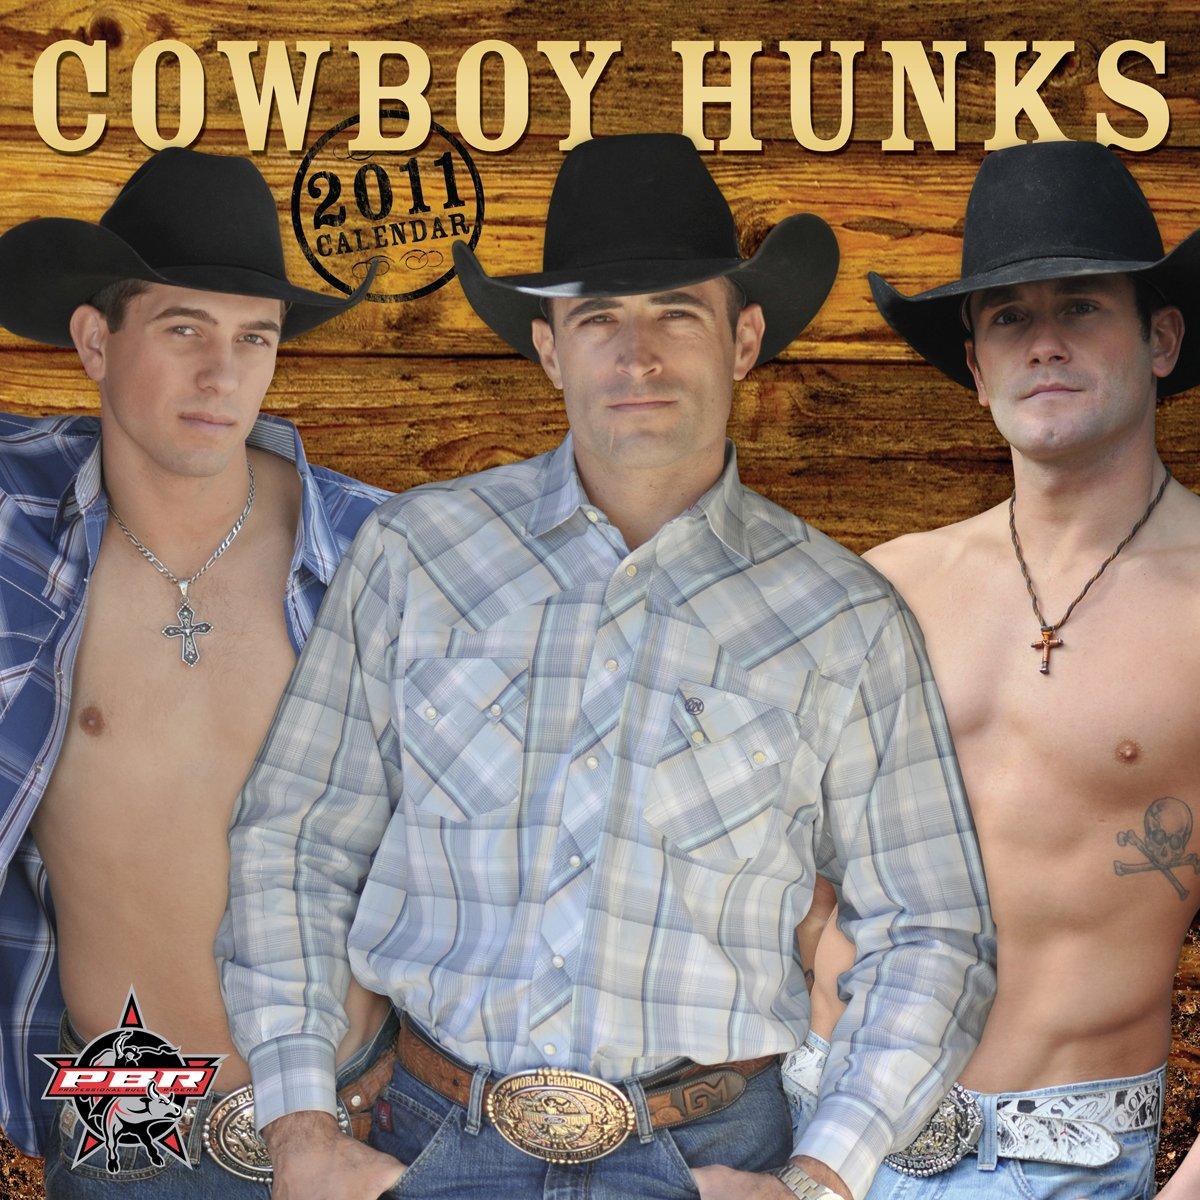 pbr cowboy hunks 2011 wall calendar